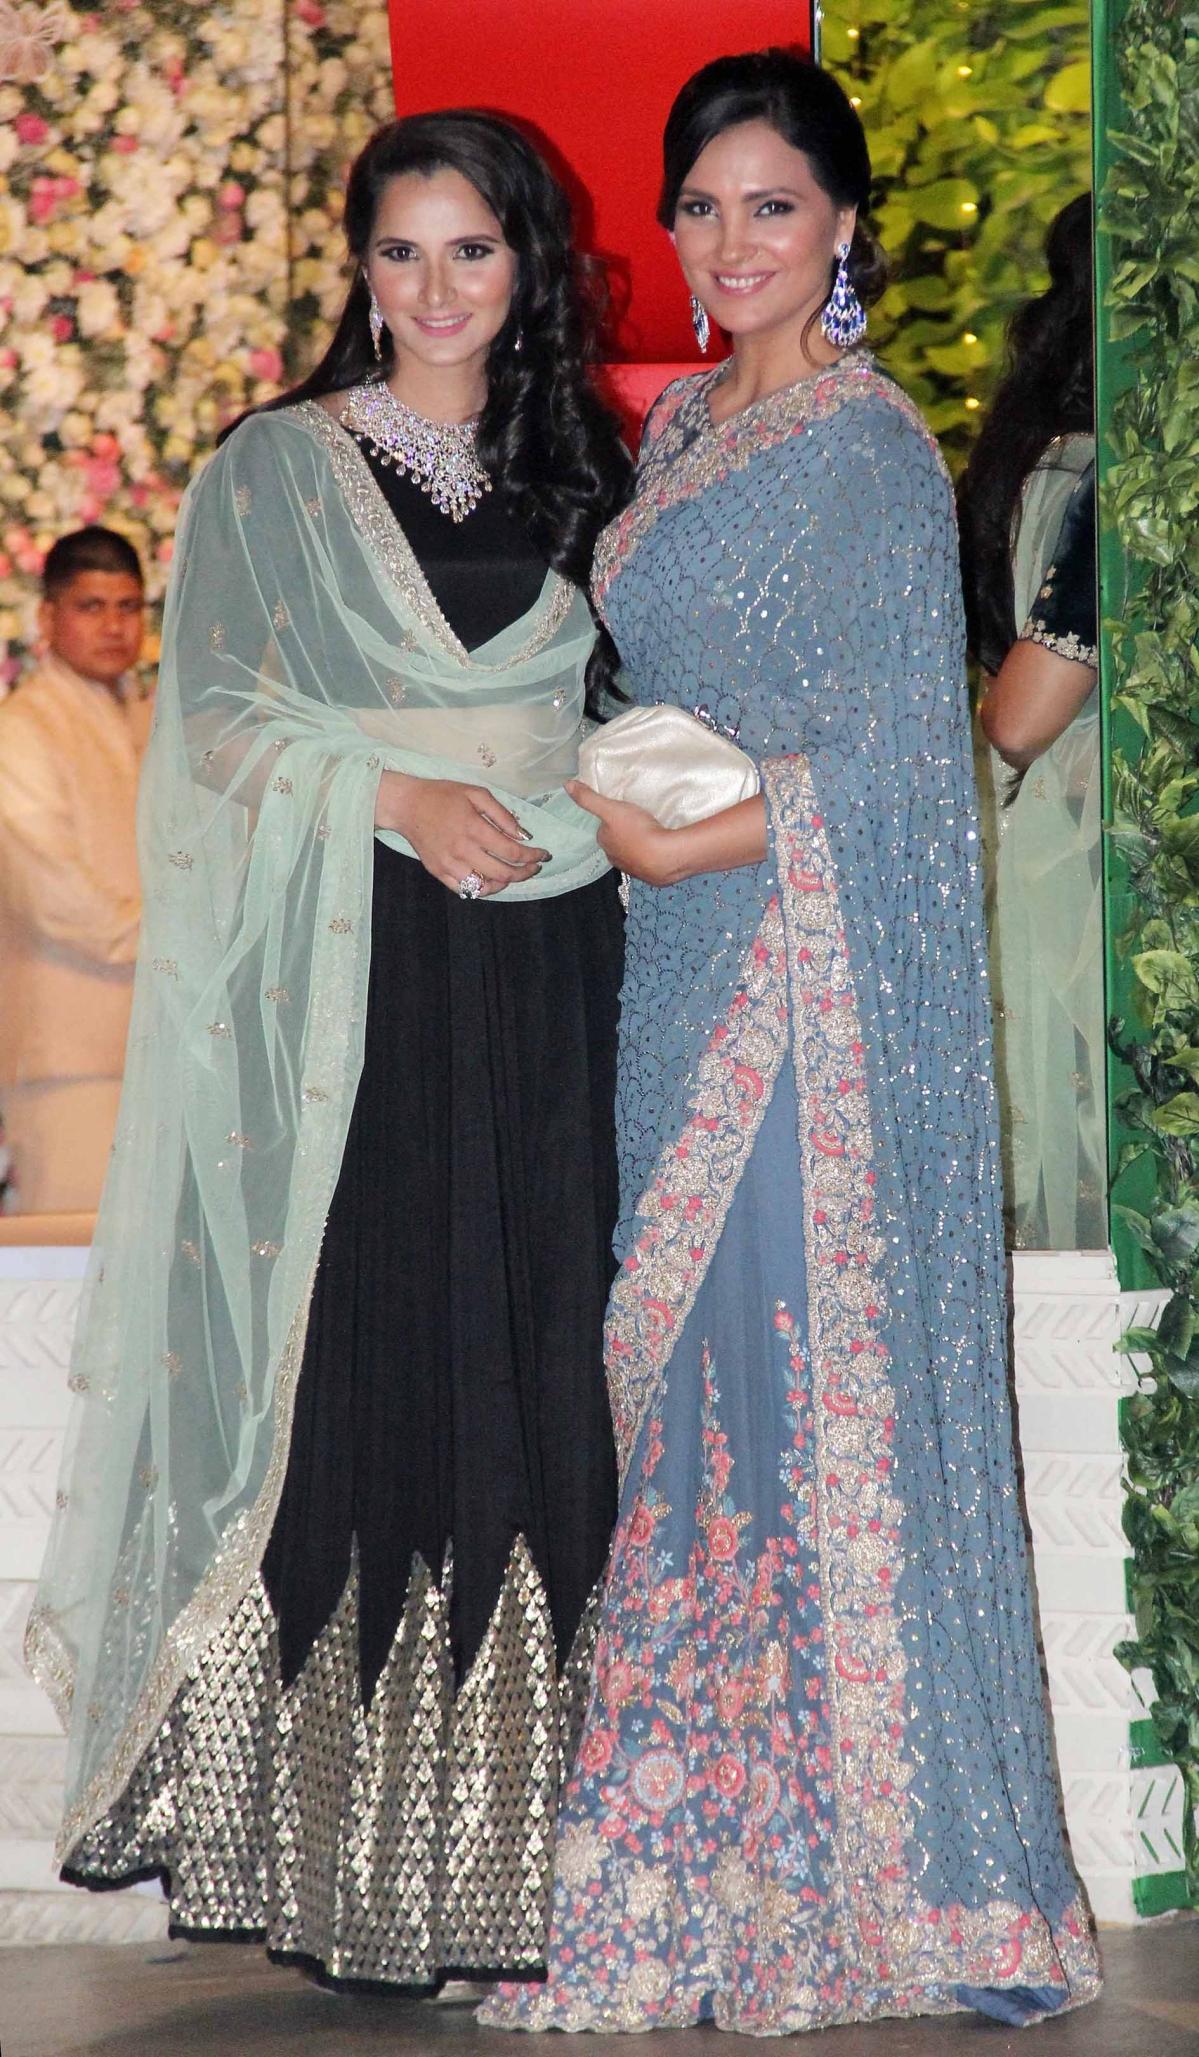 Sania Mirza And Lara Dutta At The Wedding Celebrations Photo Yogen Shah